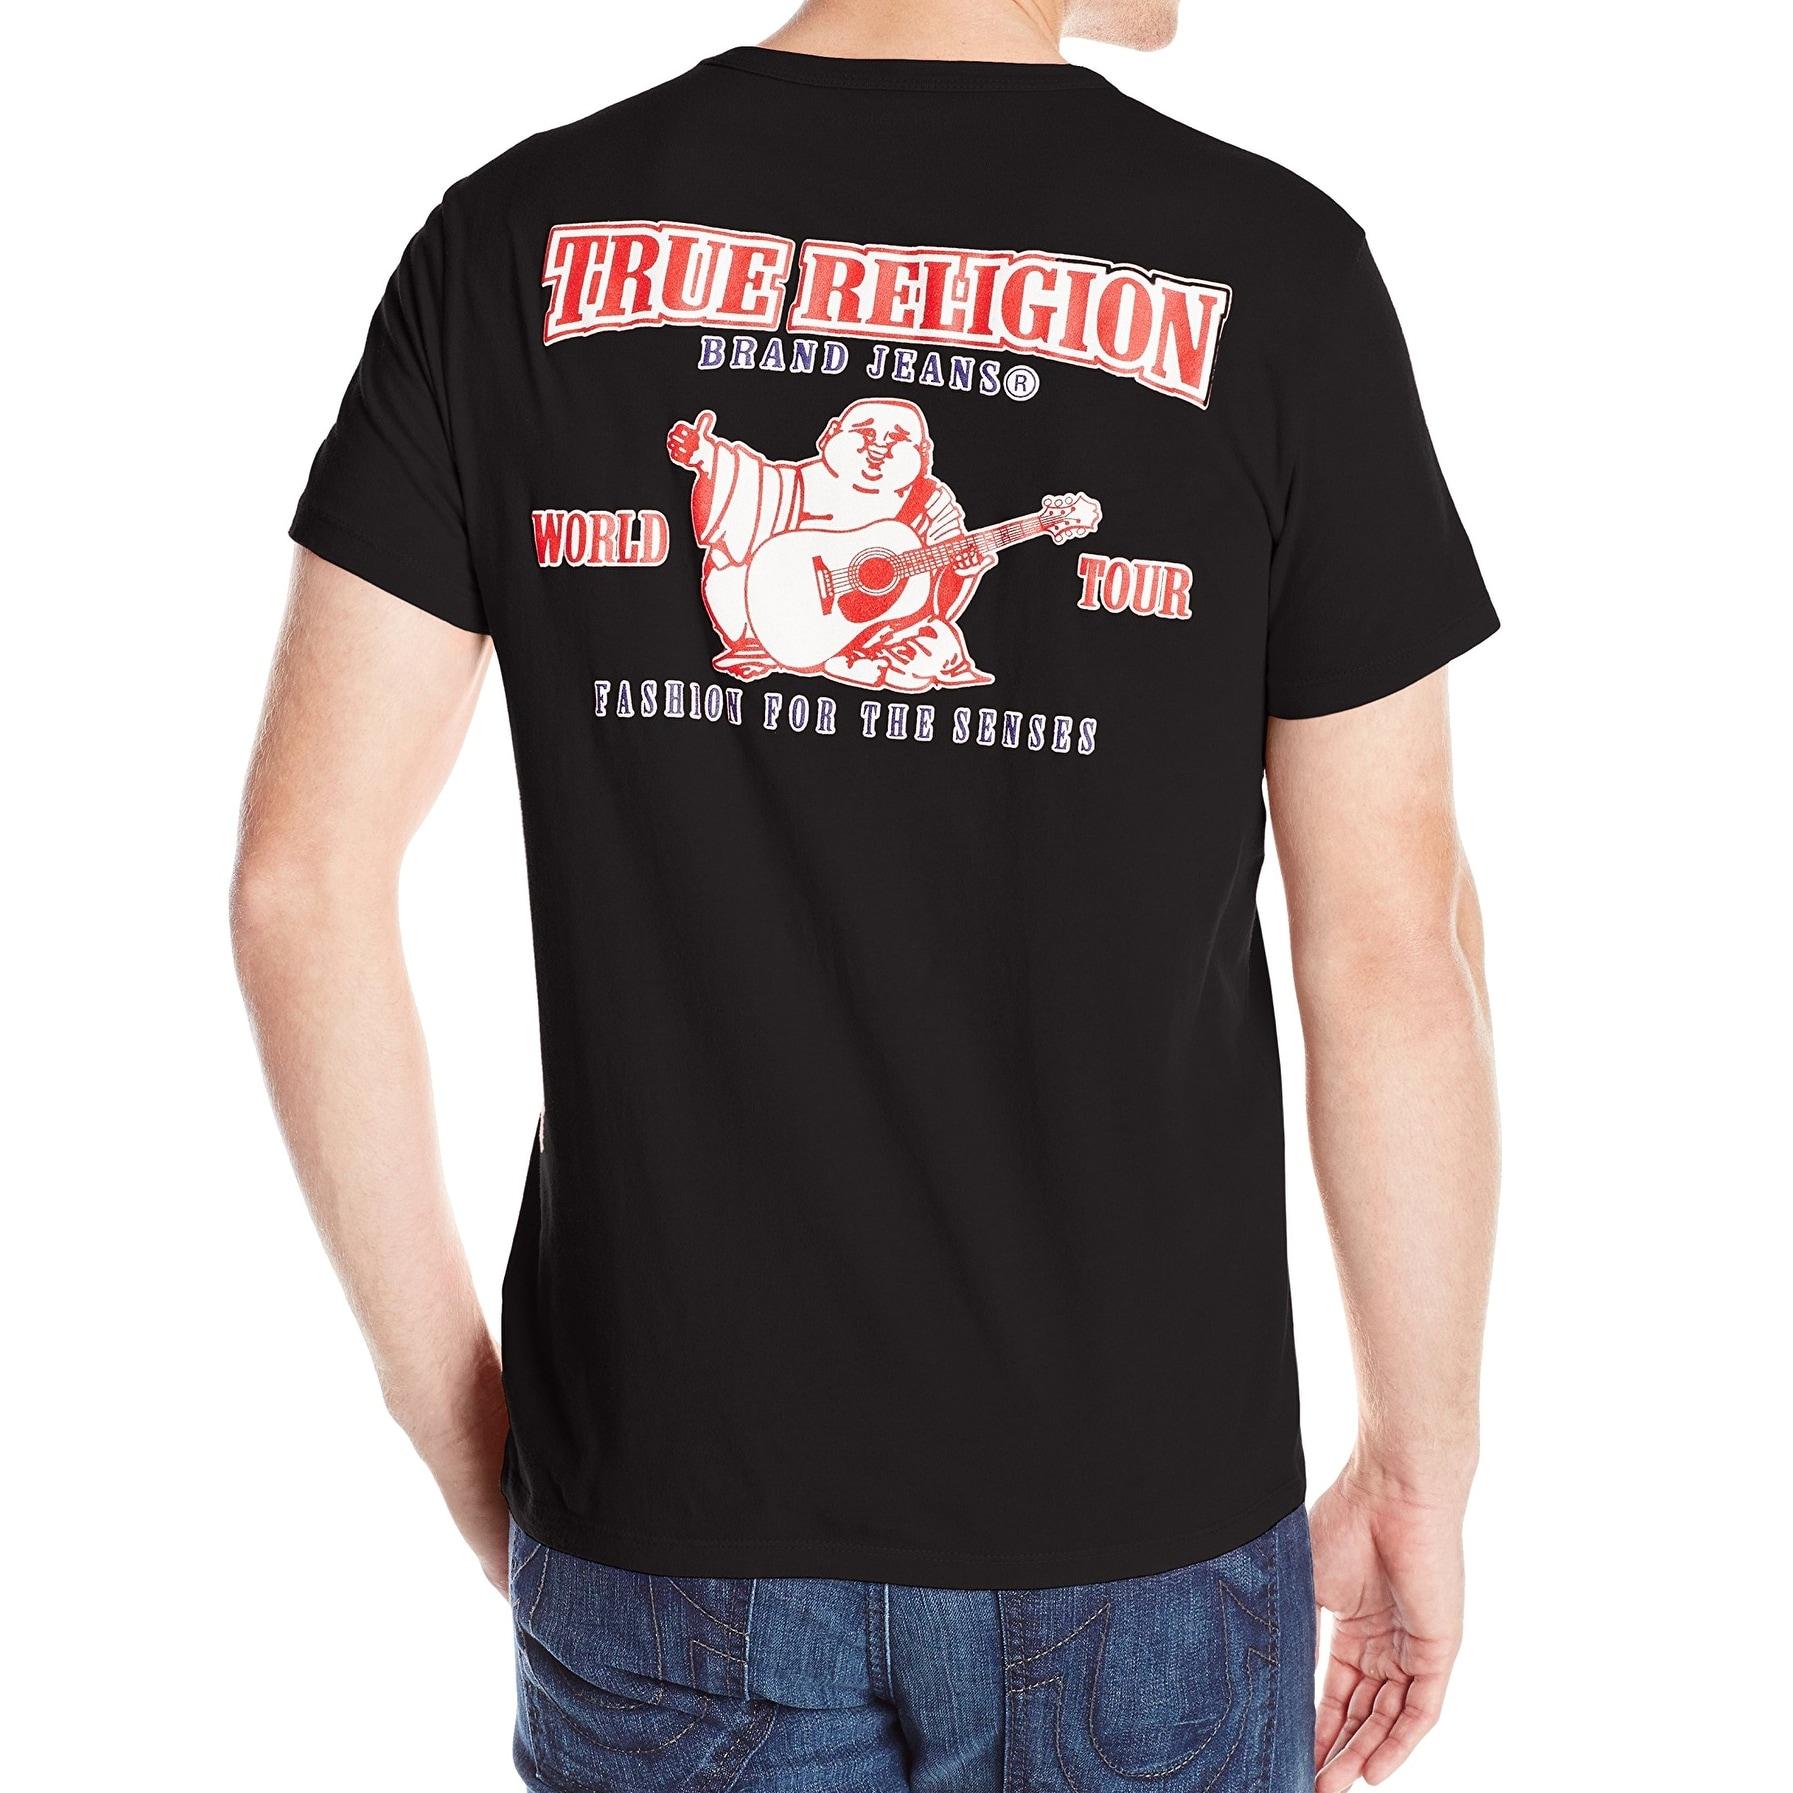 Black And Red True Religion Shirt T Shirts Design Concept